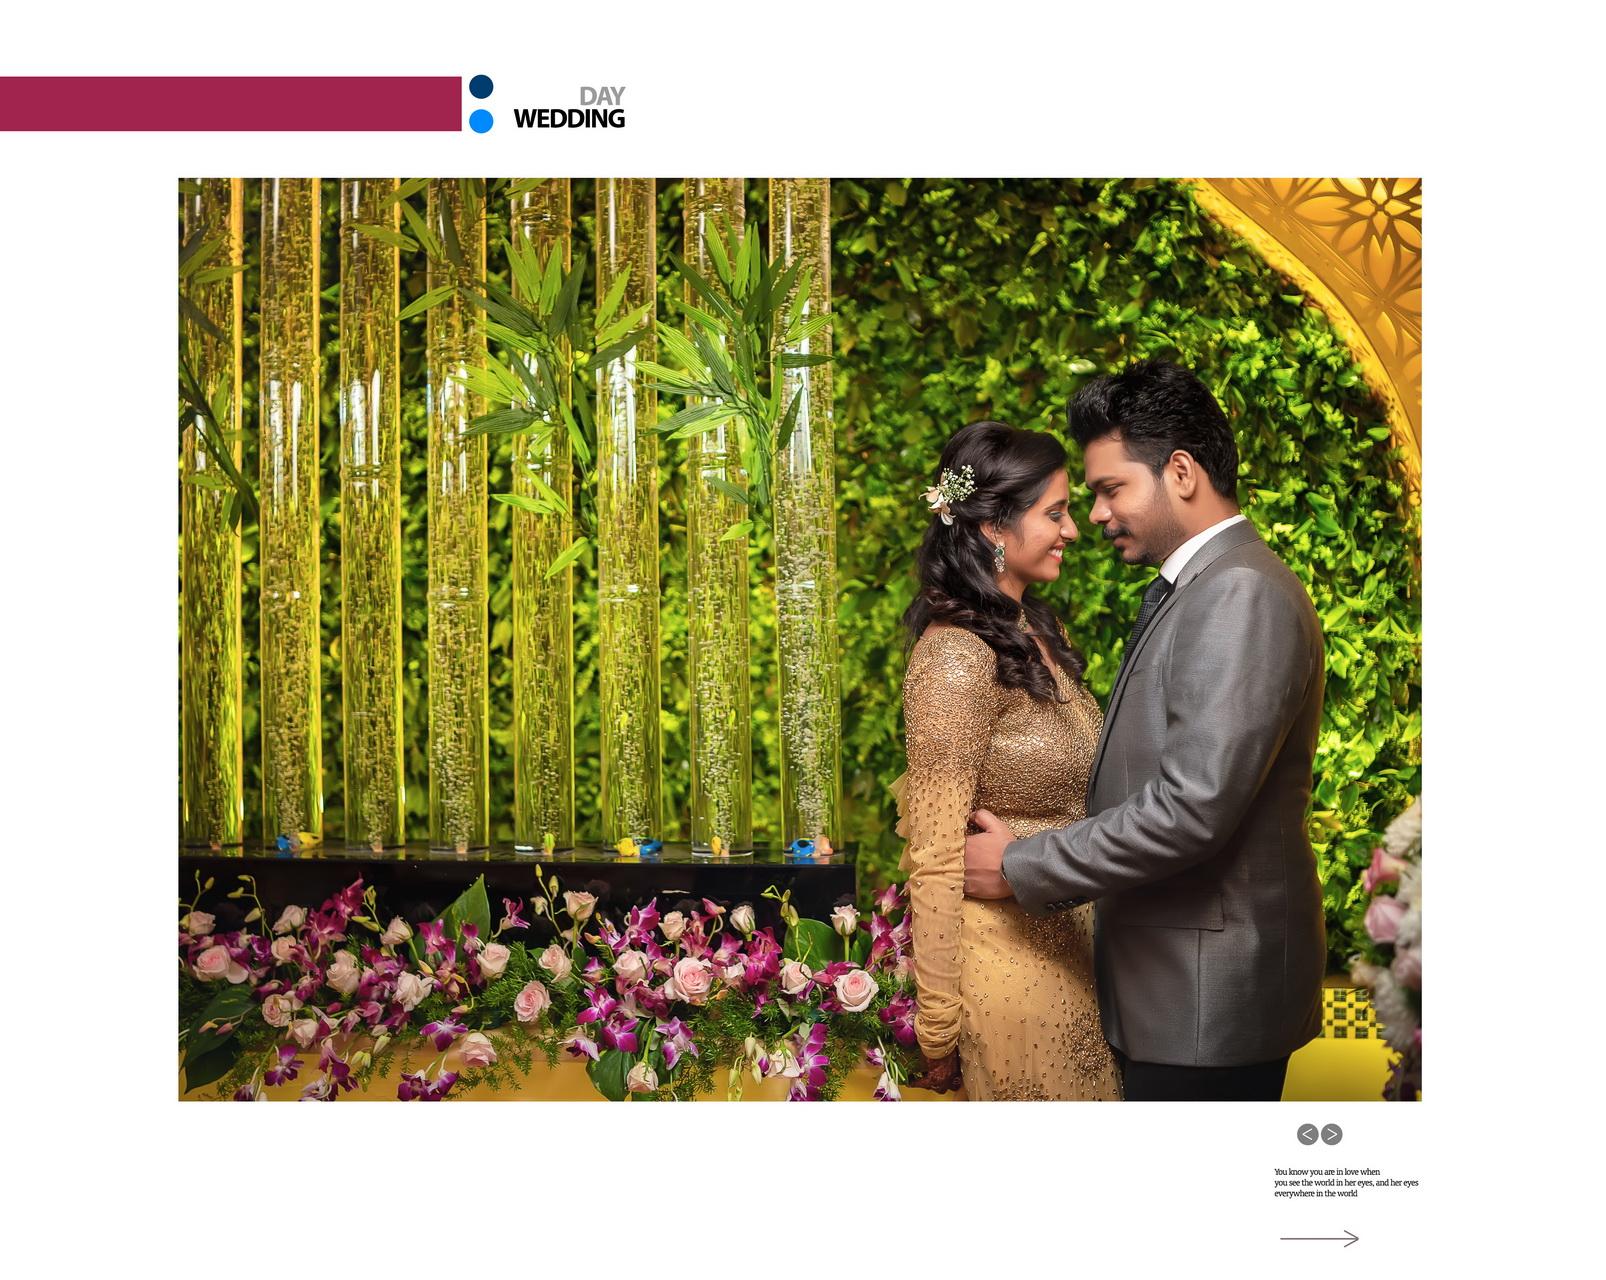 wedding photography in erode (7)